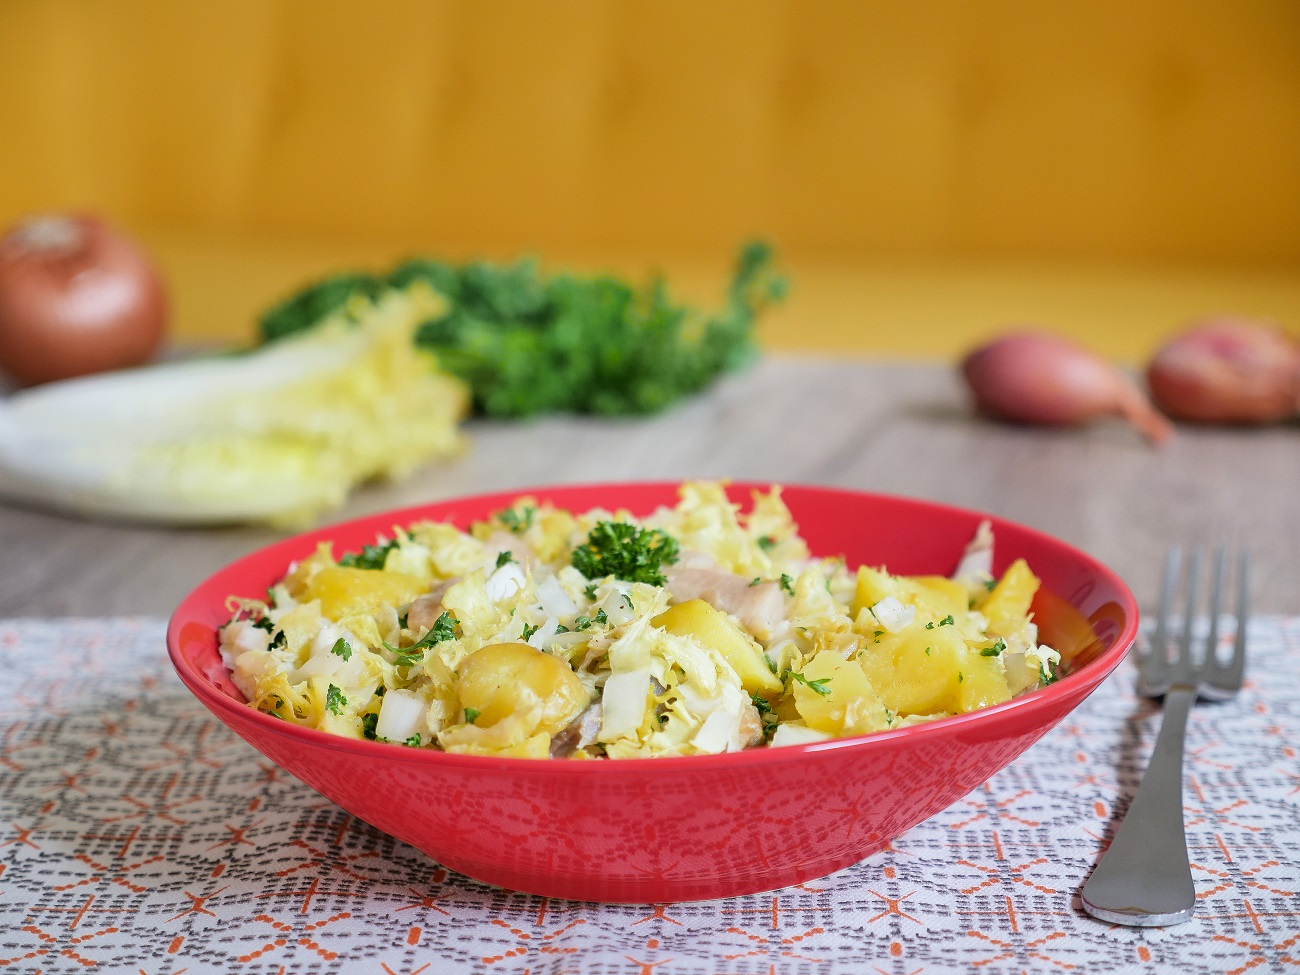 Recette salade tiède pommes de terre harengs